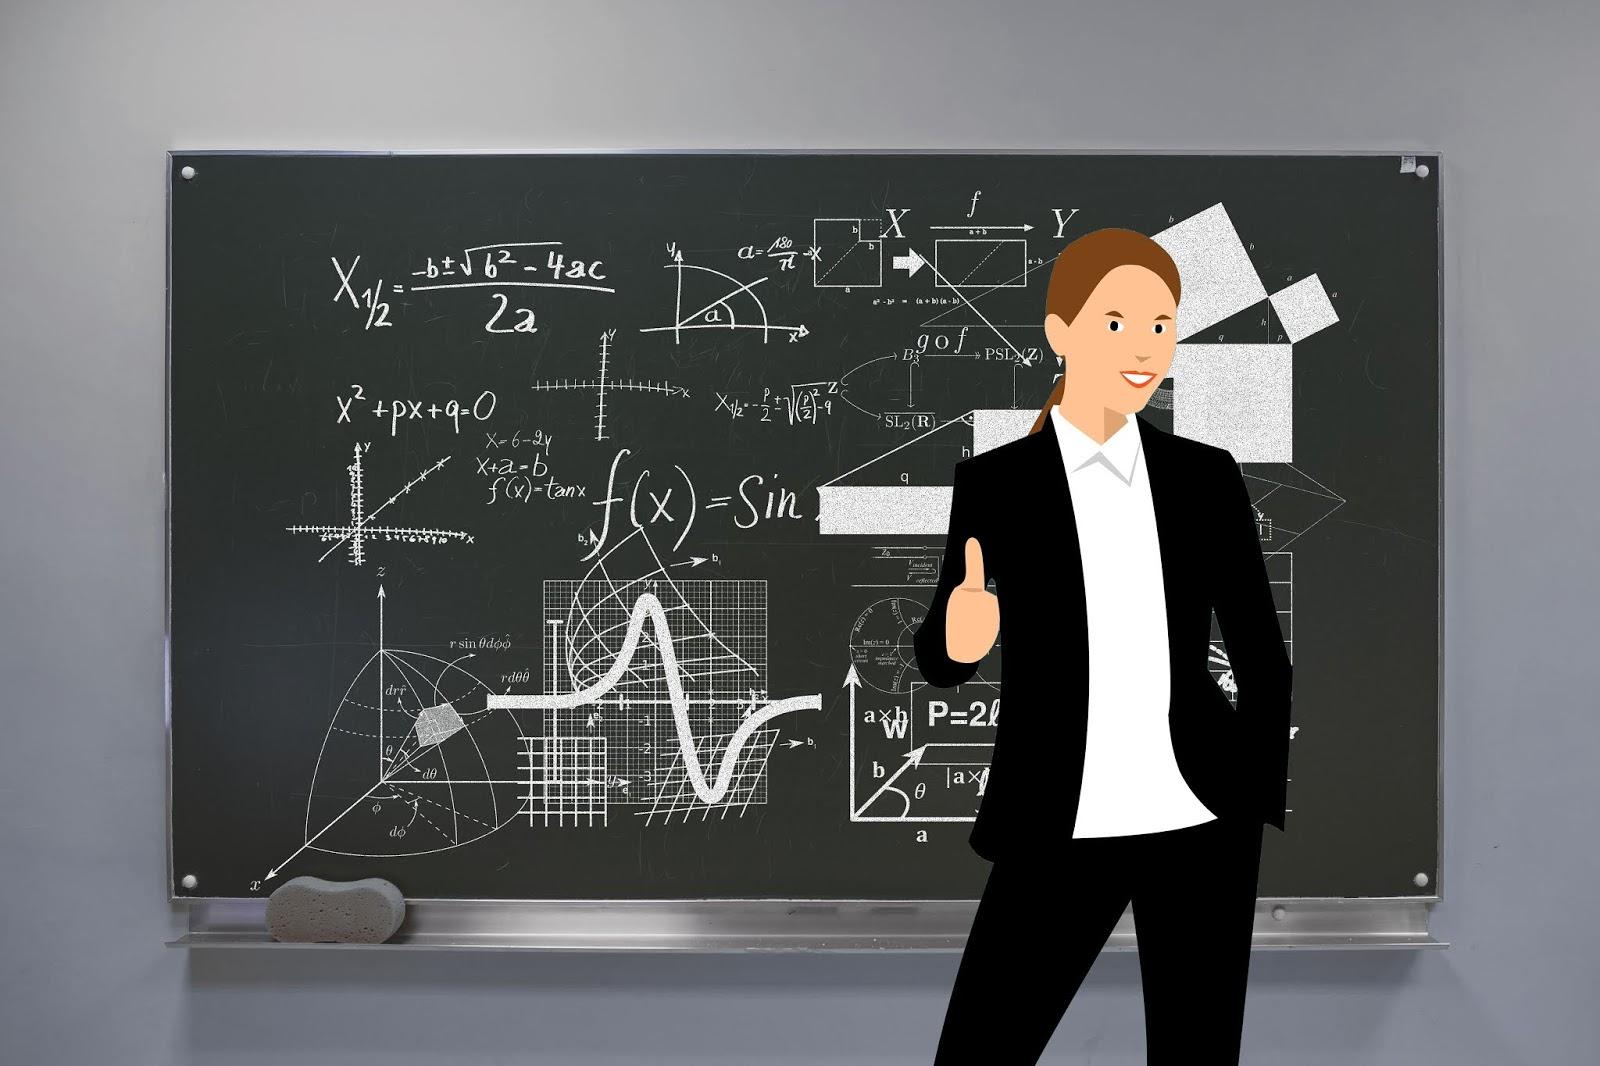 Matematika Alternatif Bisa Diadopsi